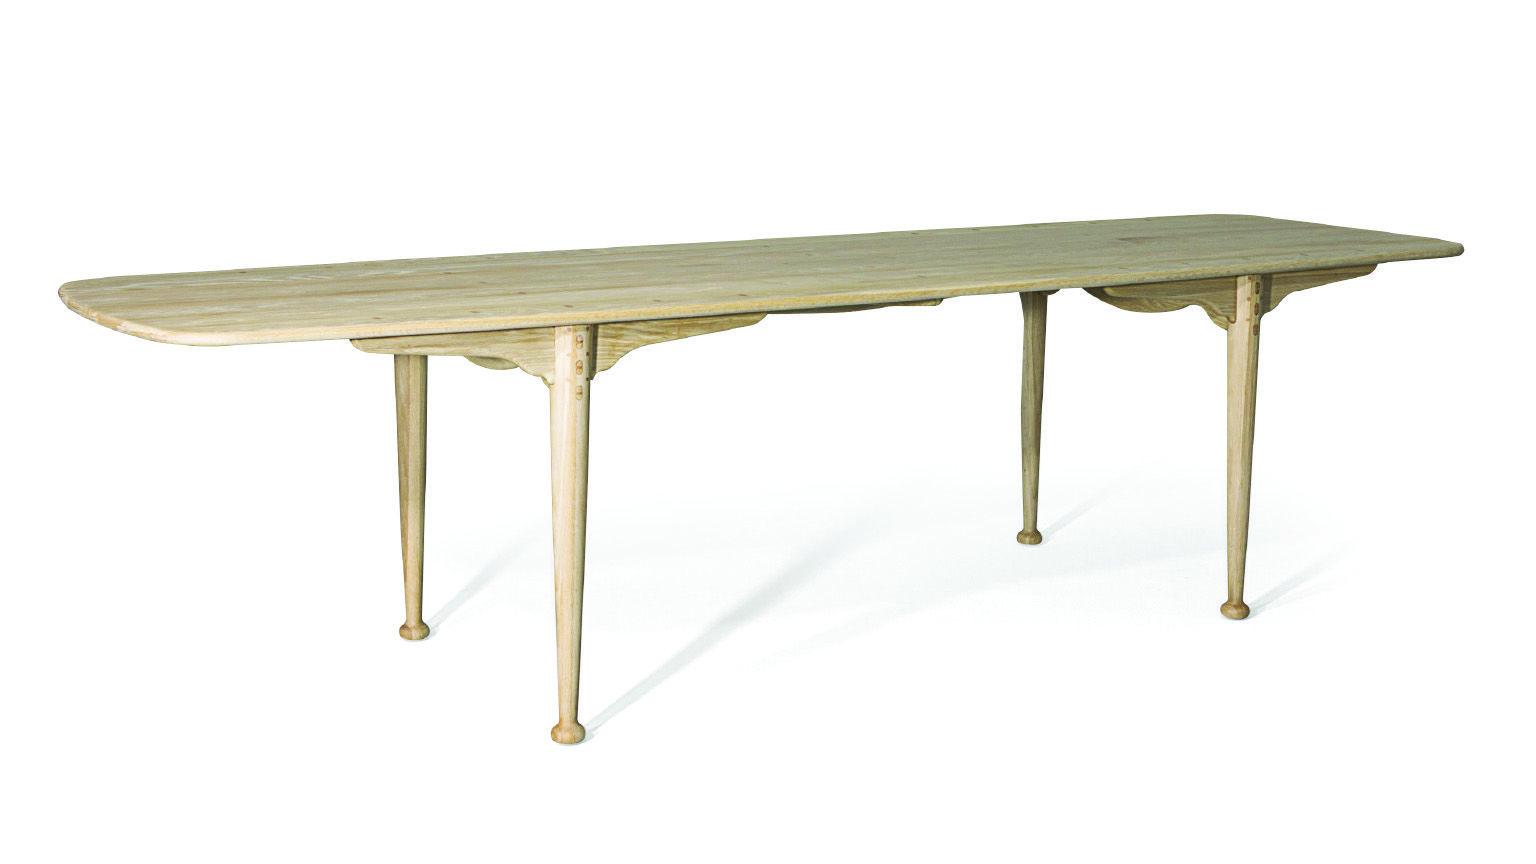 Julian Chichester Home decor, Folding table, Decor